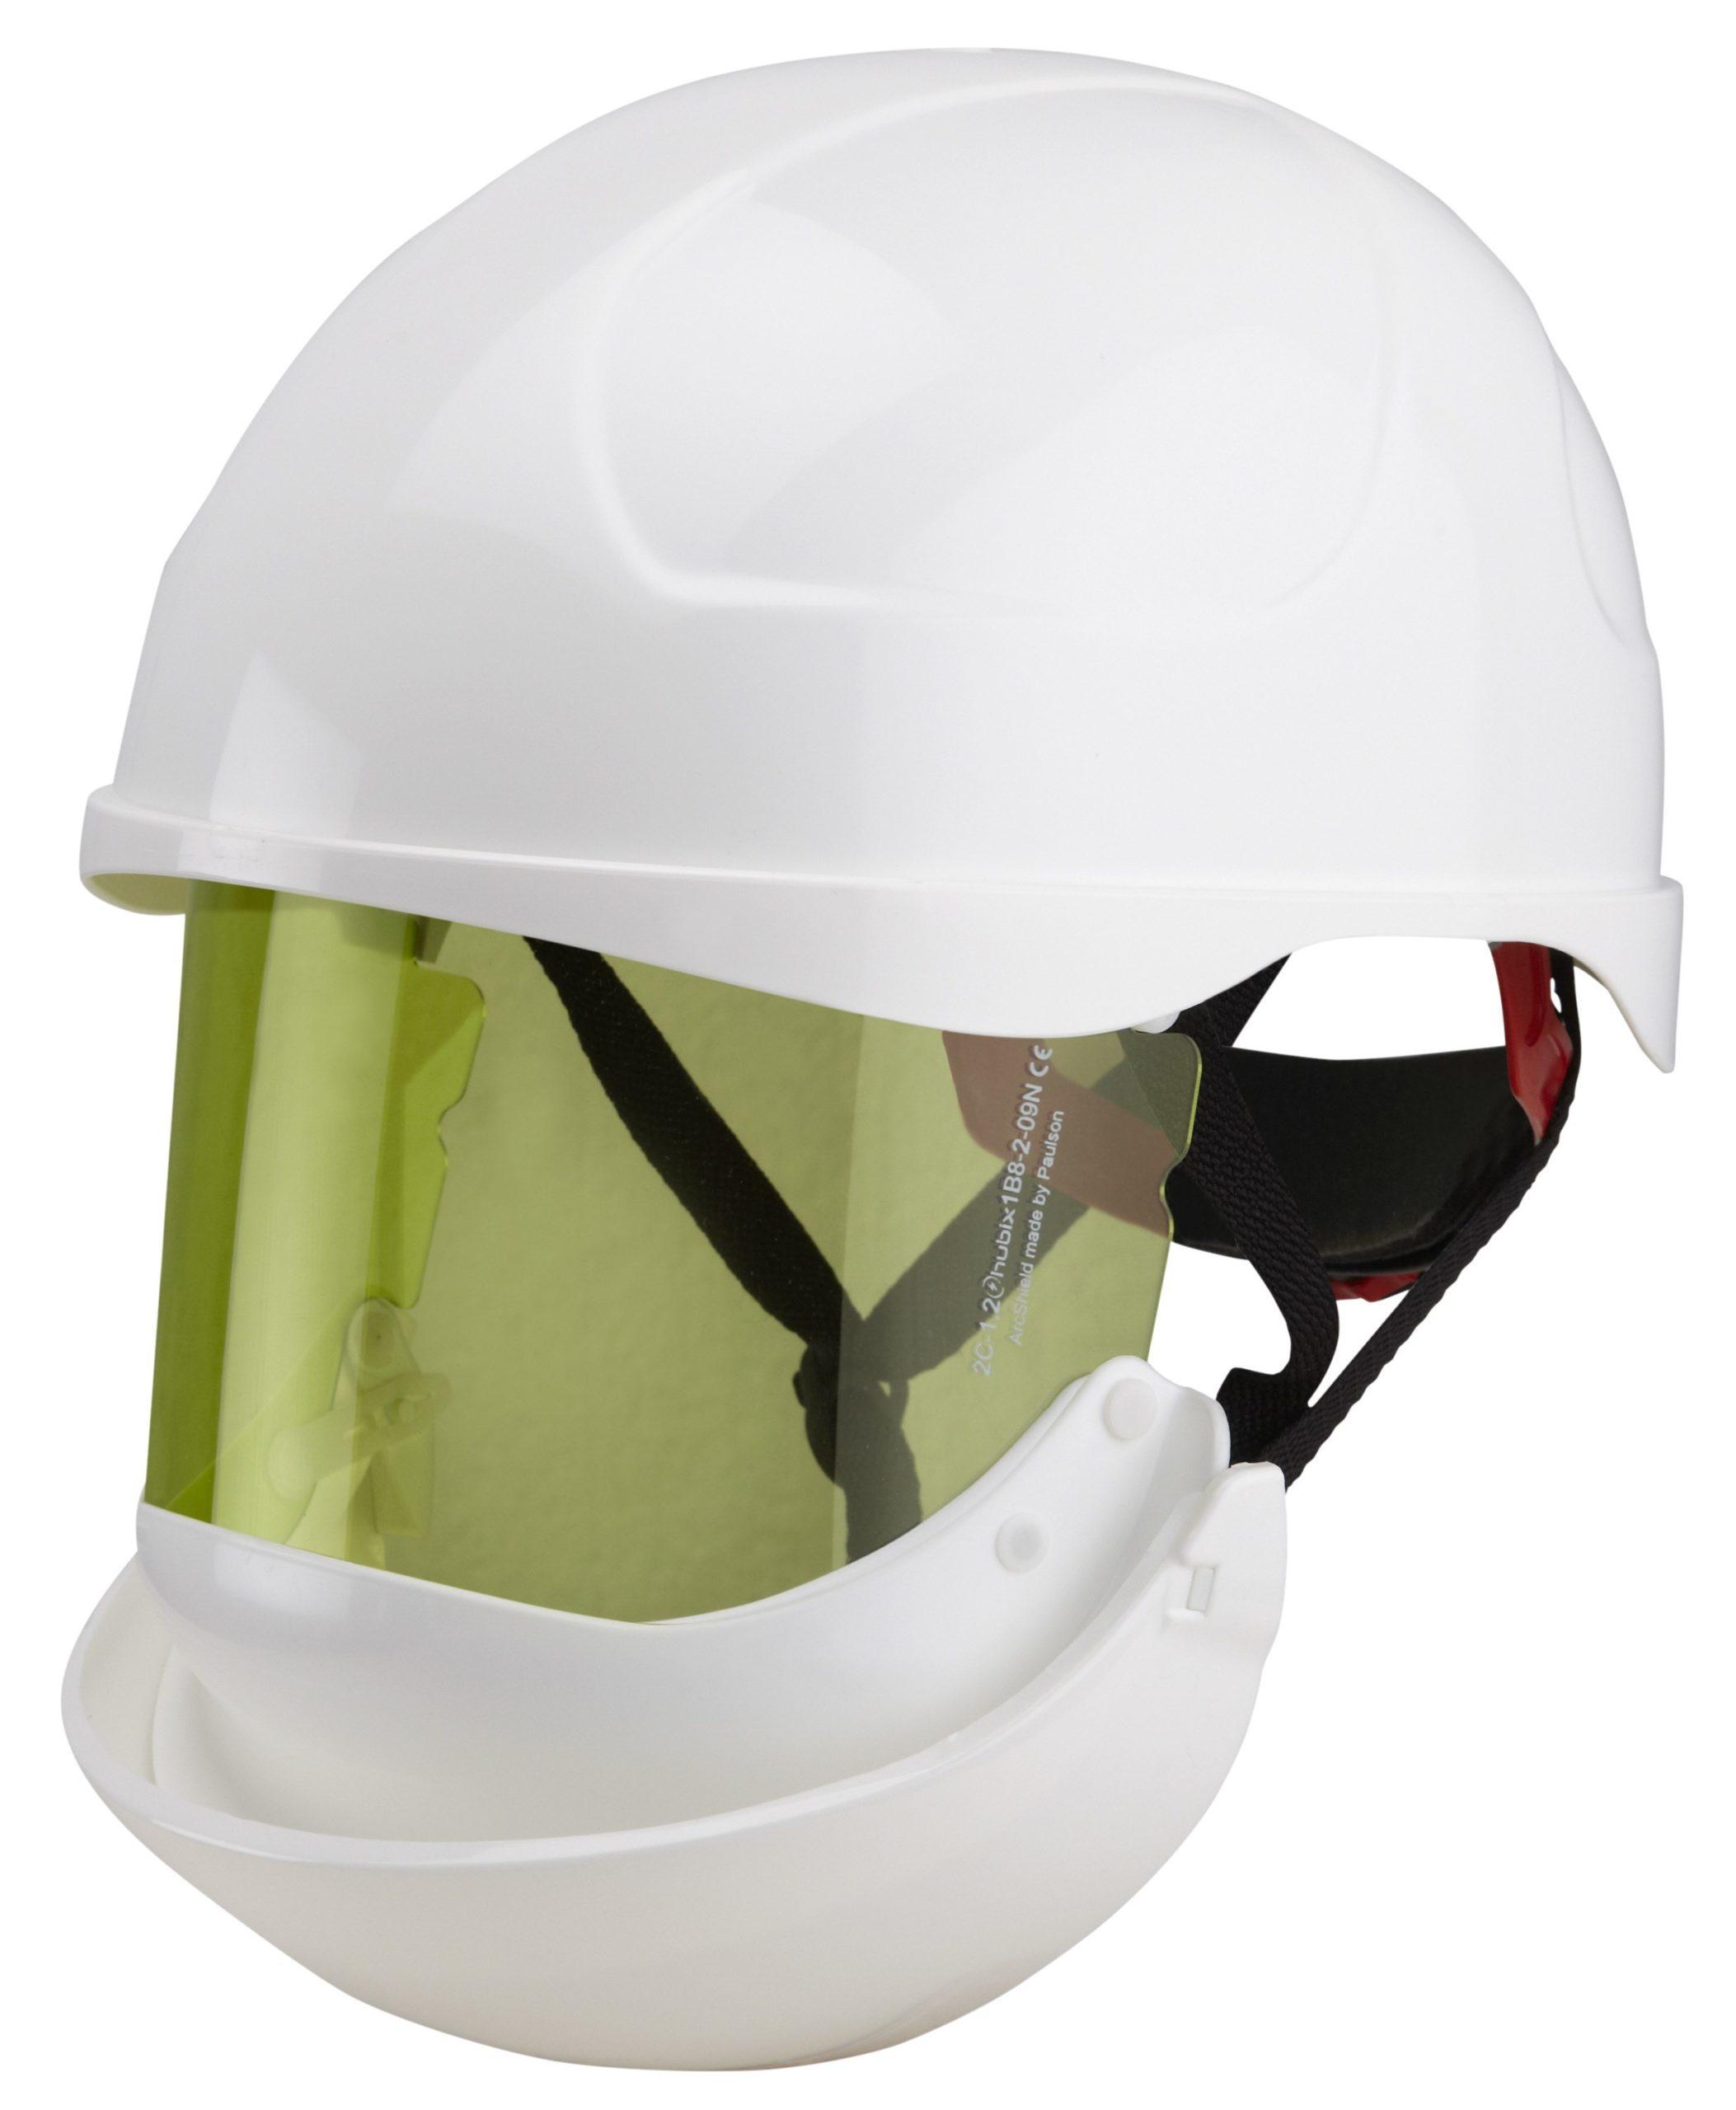 ProGARM 2688 Arc Flash Safety Helmet